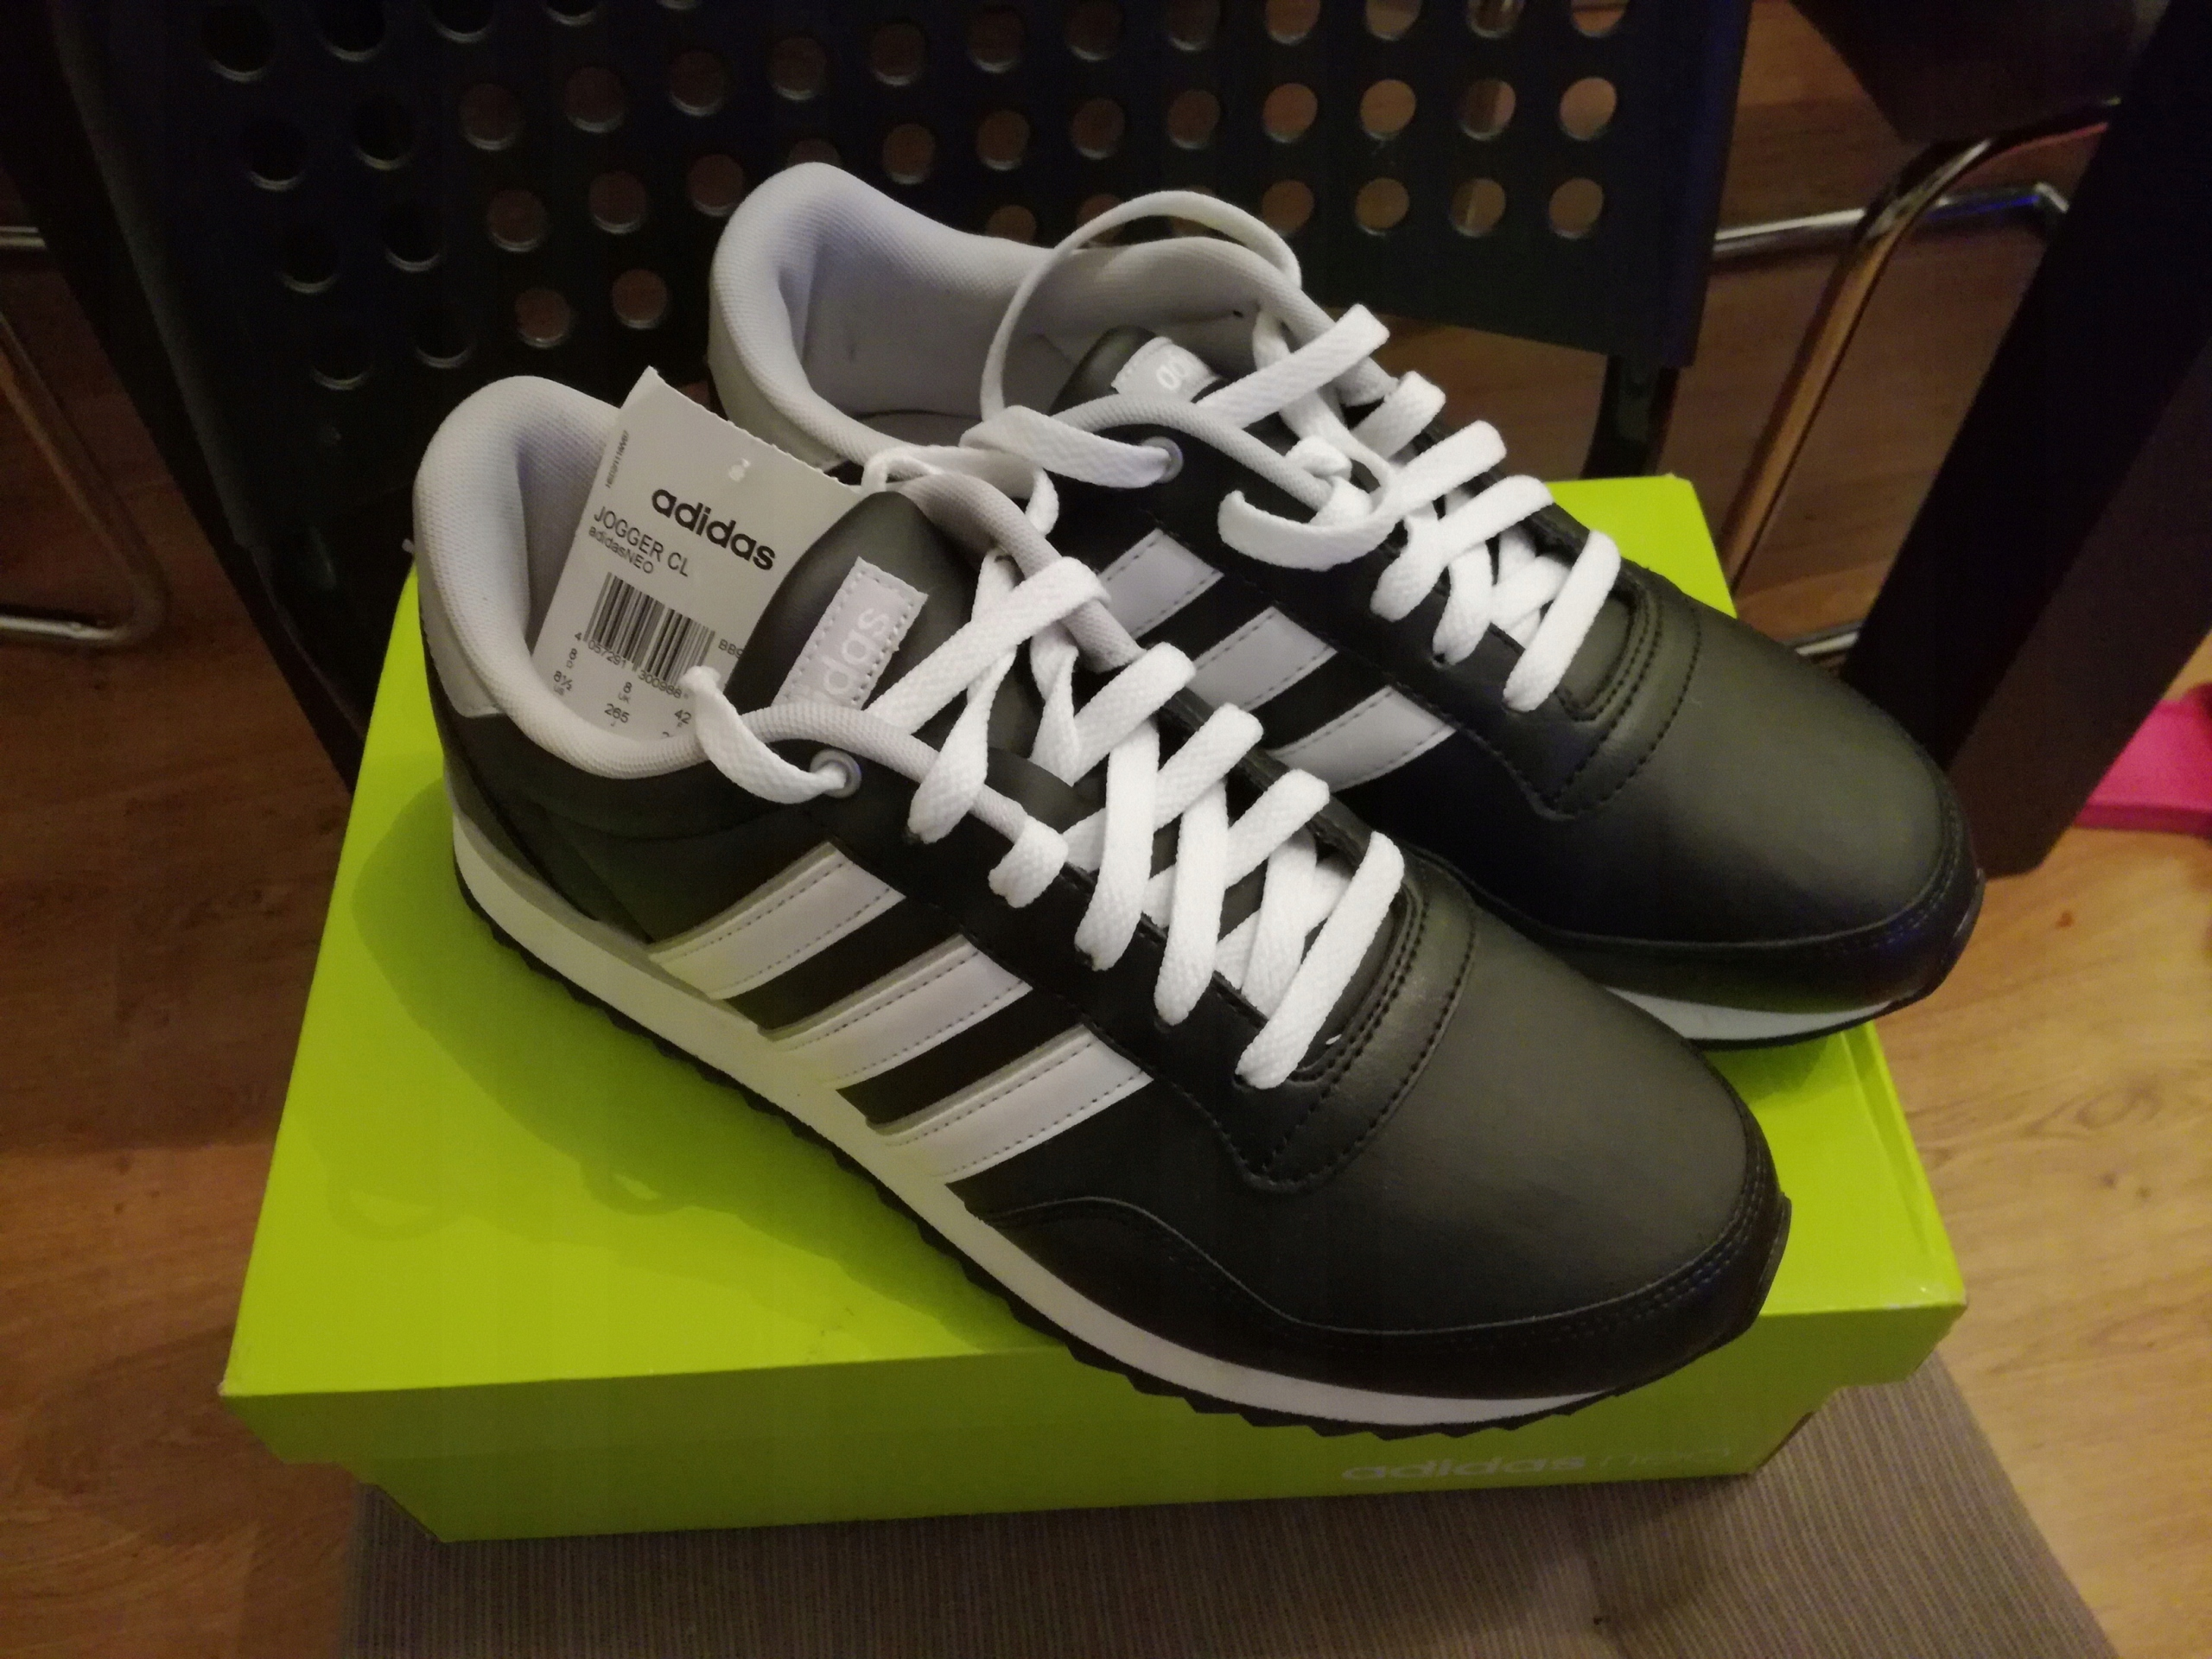 45f3be62 Buty Adidas Jogger CL adidasNEO - 7579632675 - oficjalne archiwum ...